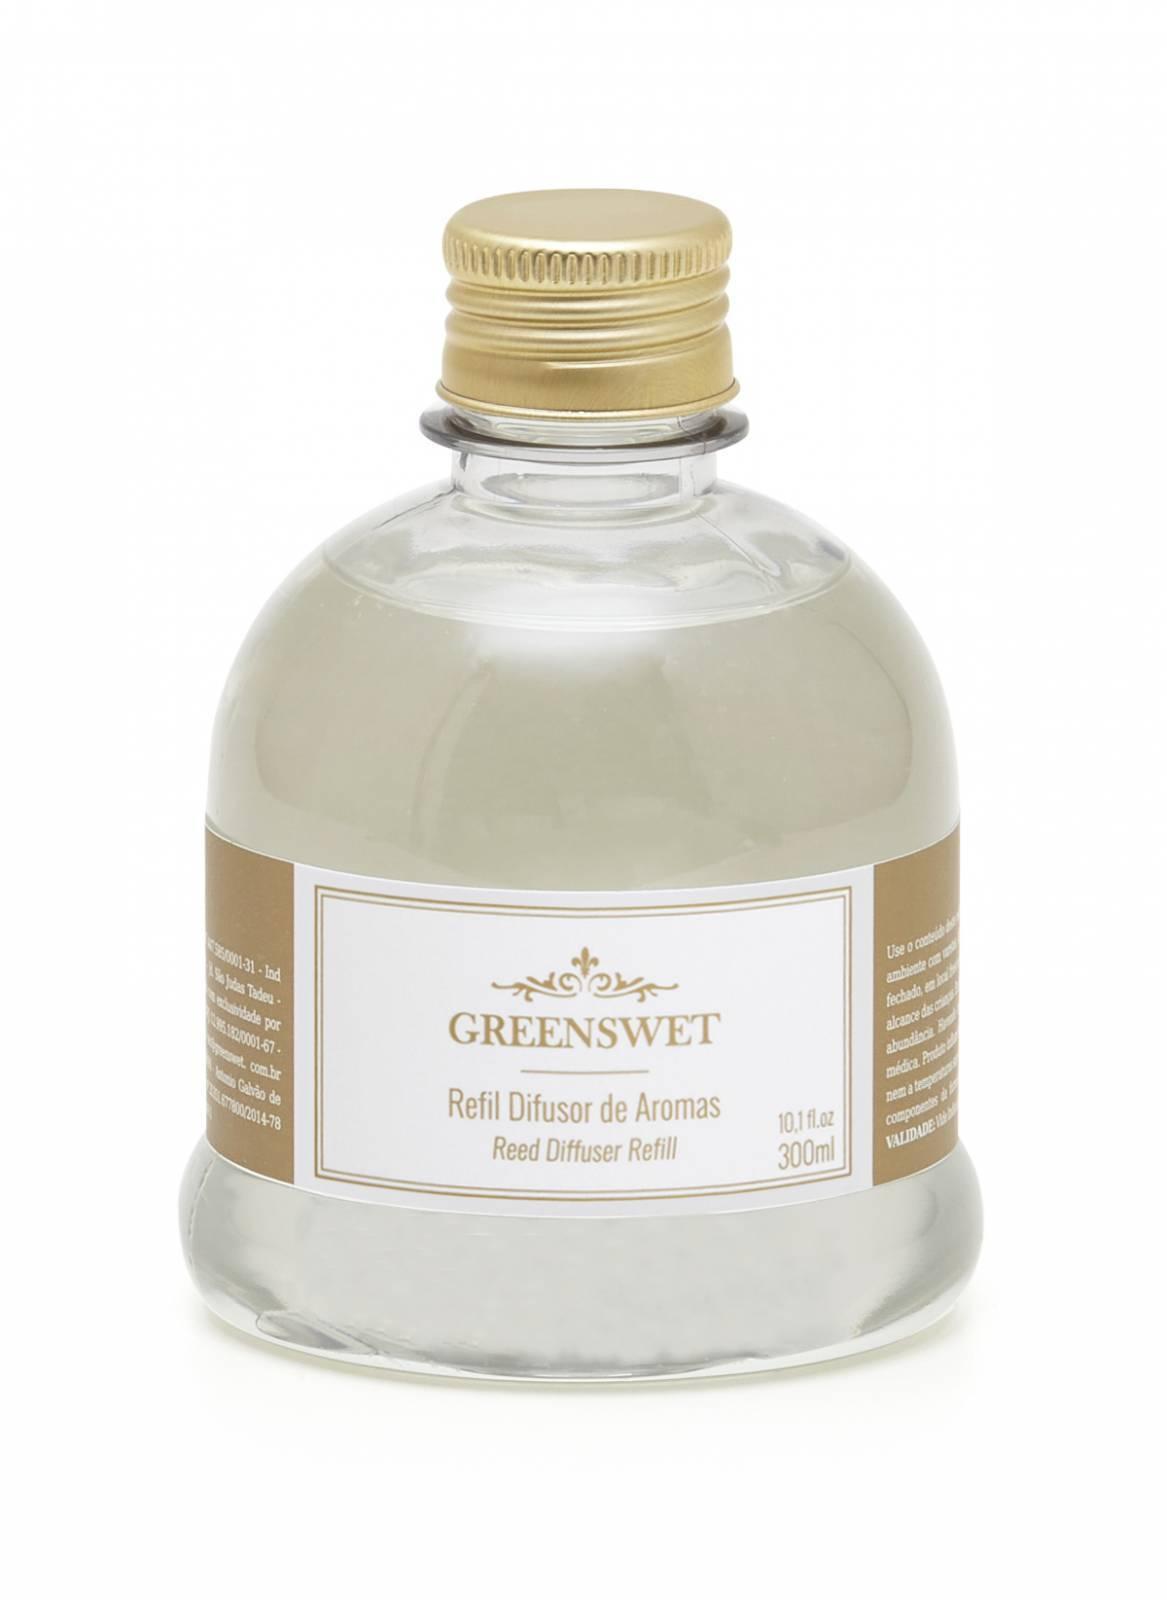 Refil Difusor de Aromas 300ml Quartzo Branco - Greenswet Aromatizantes